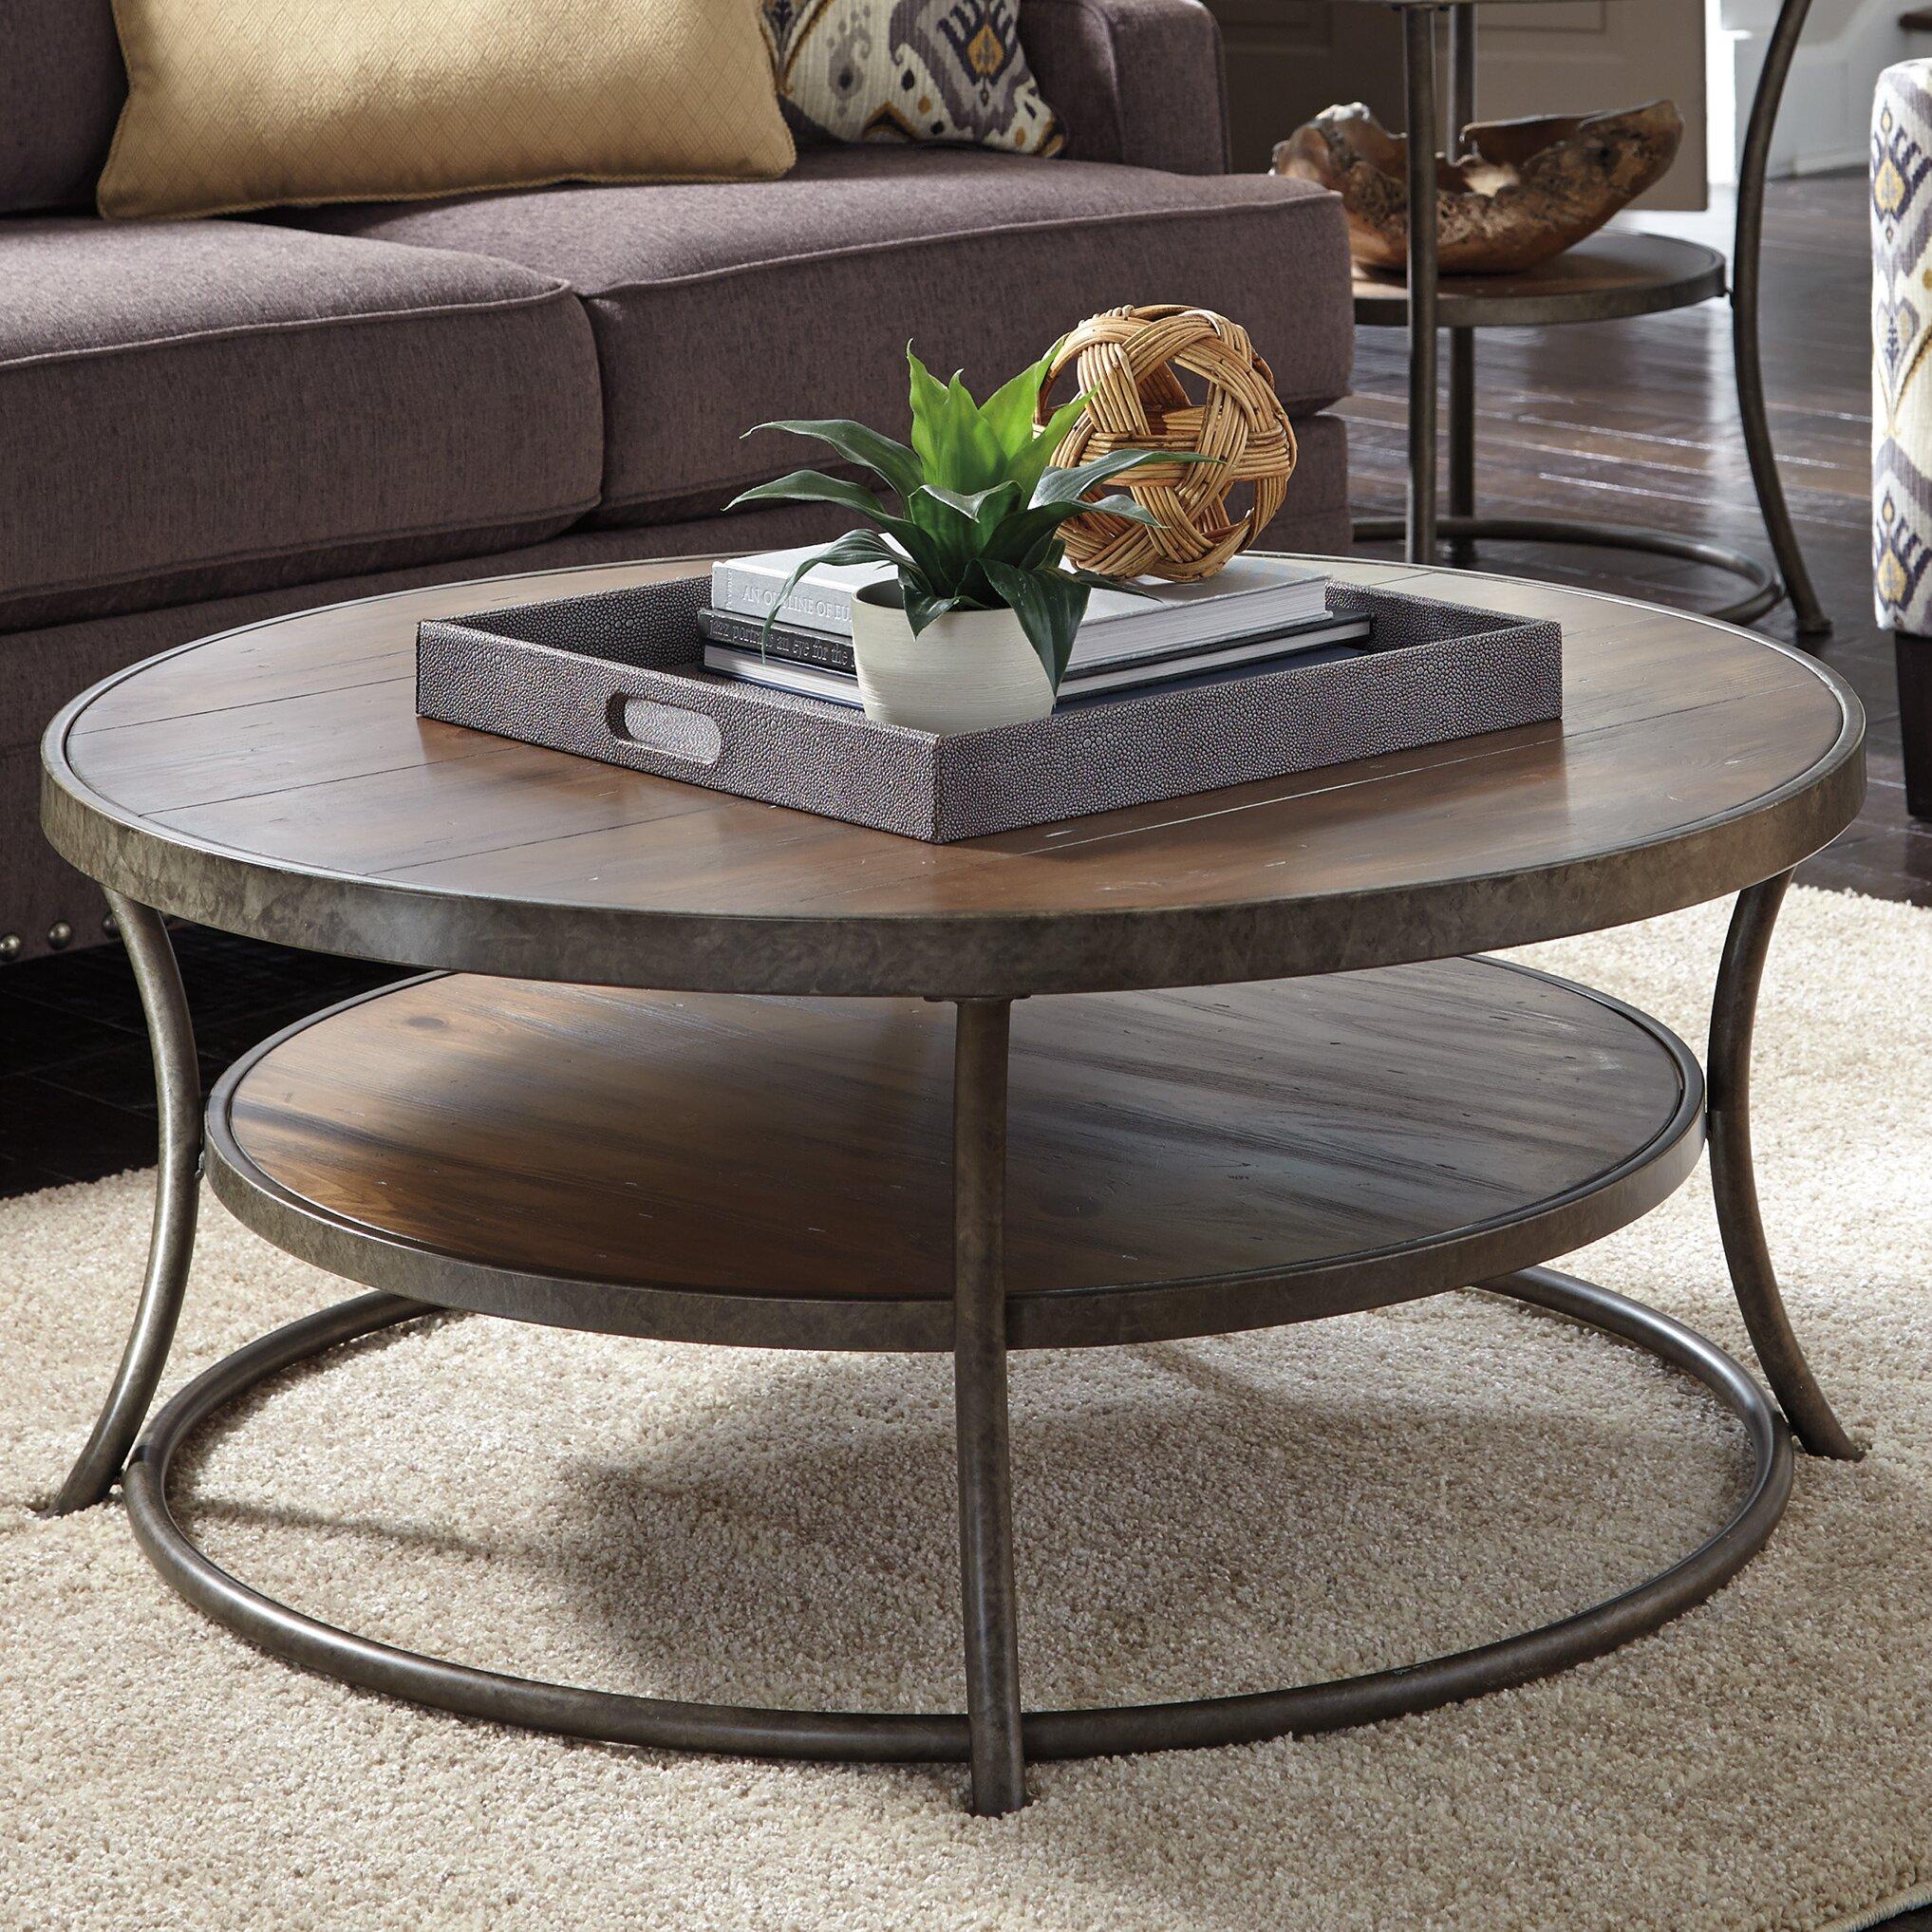 Round Coffee Tables At Homegoods: Loon Peak Bendeleben Coffee Table & Reviews